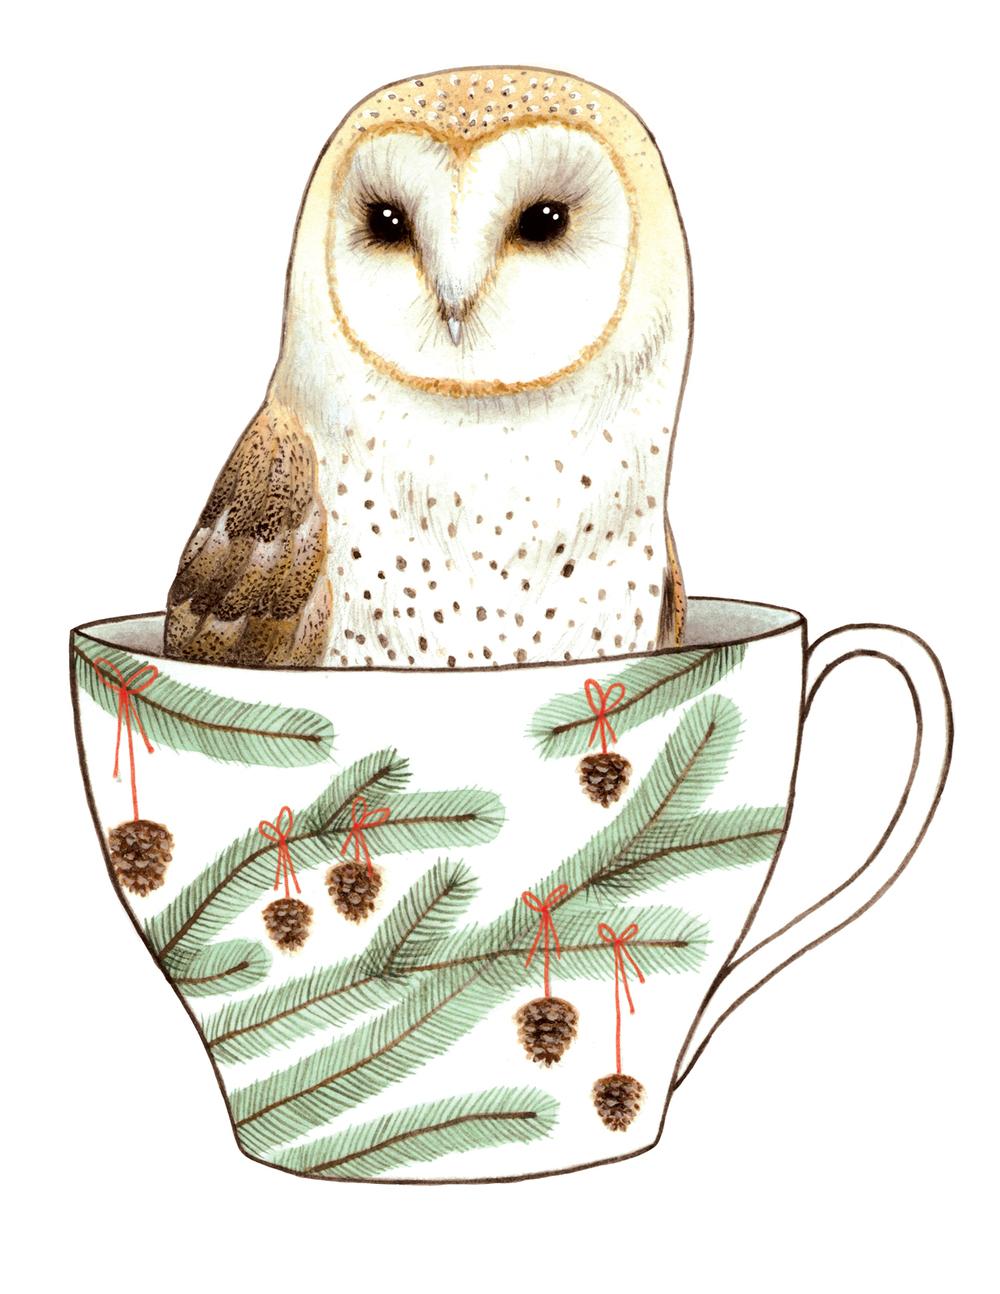 Barn Owl in a Teacup II